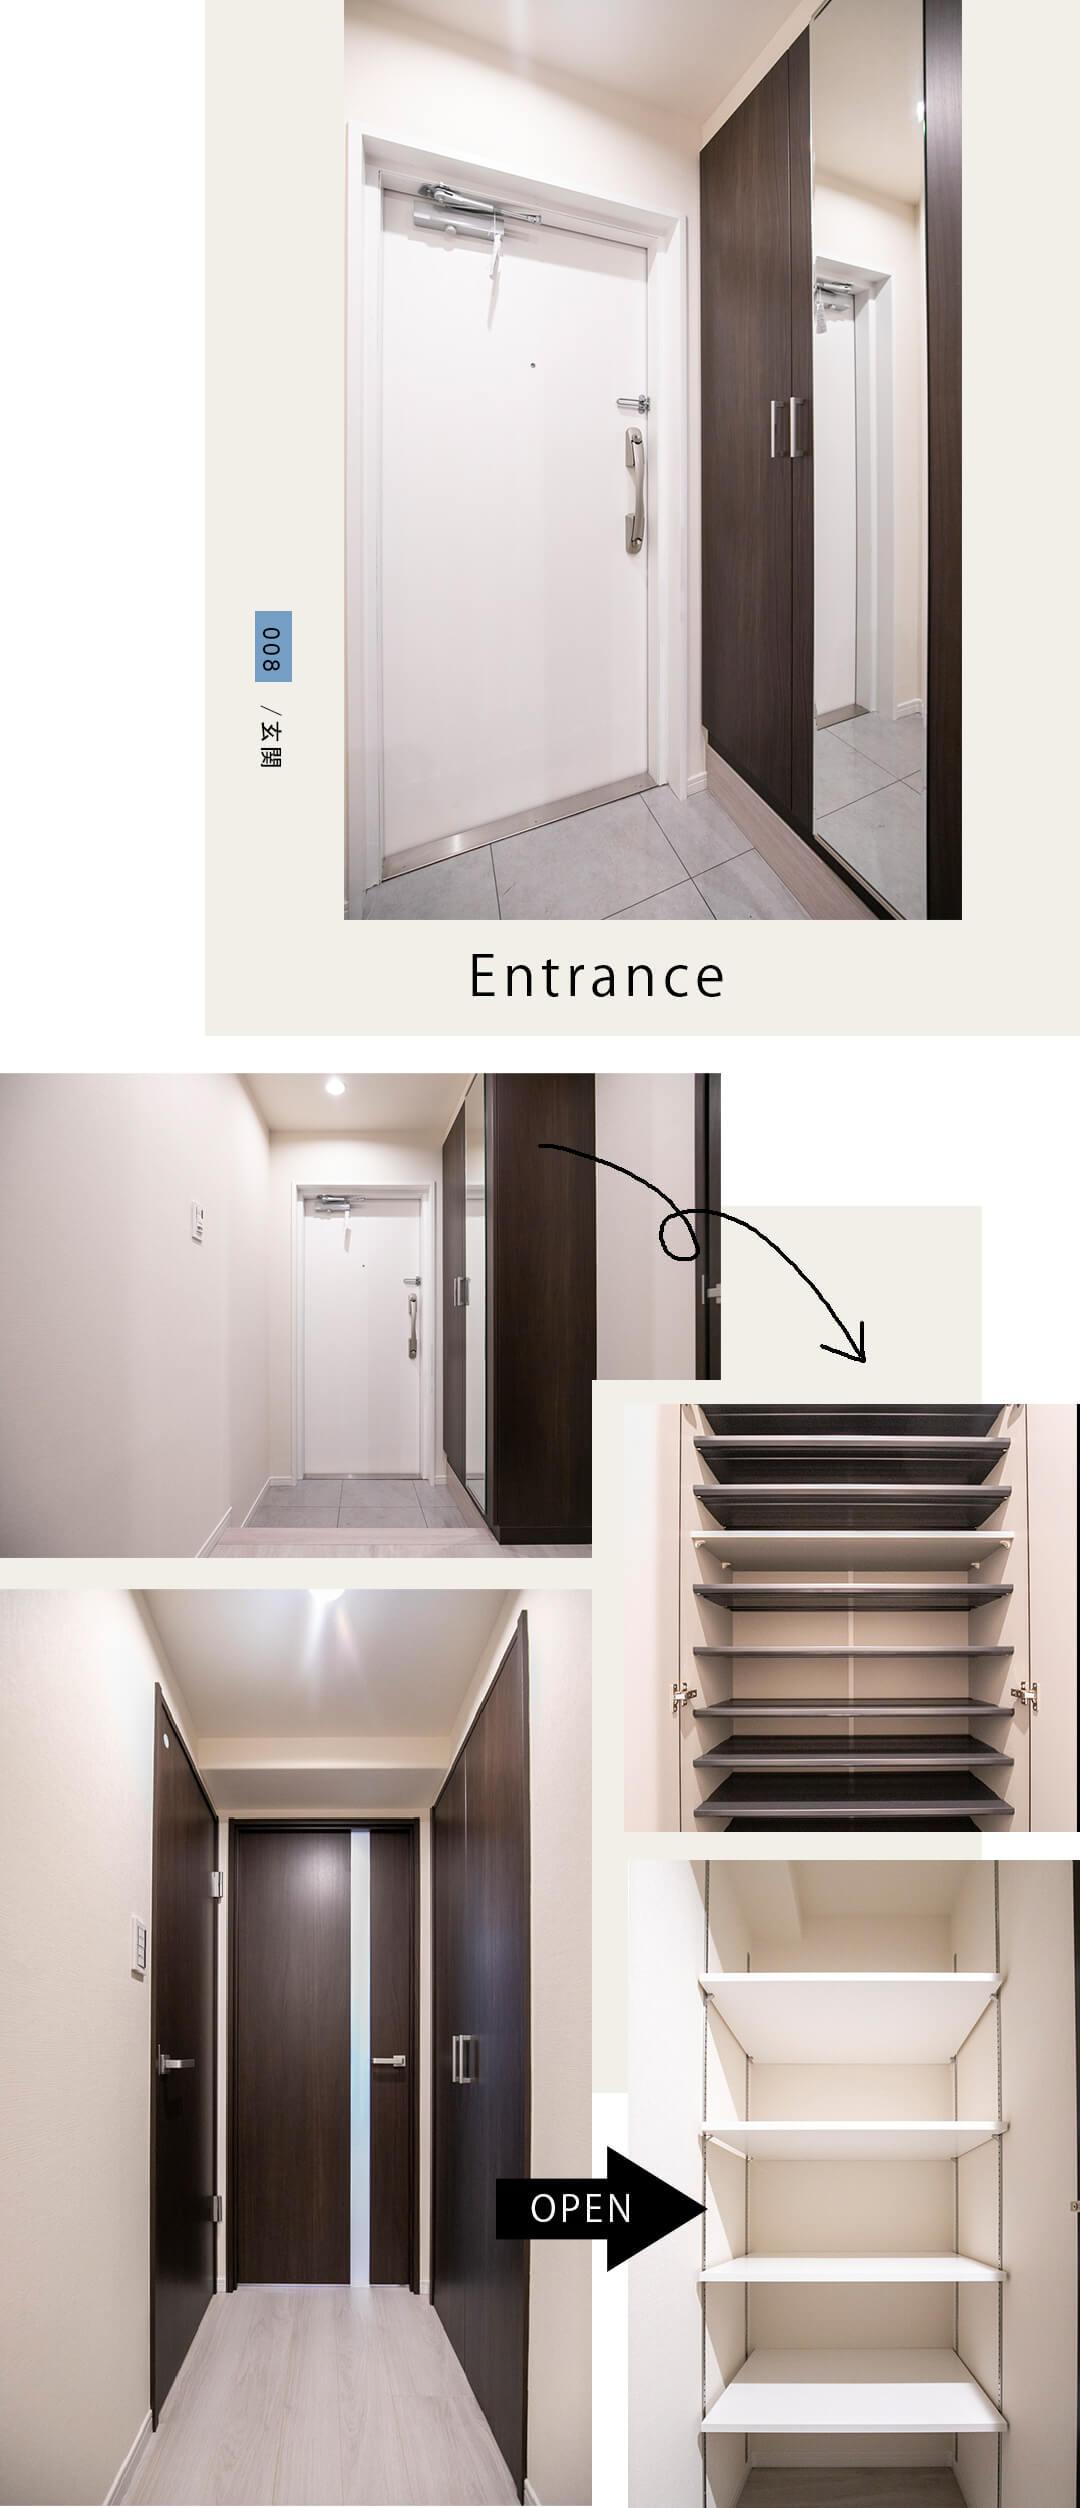 008,Entrance,玄関